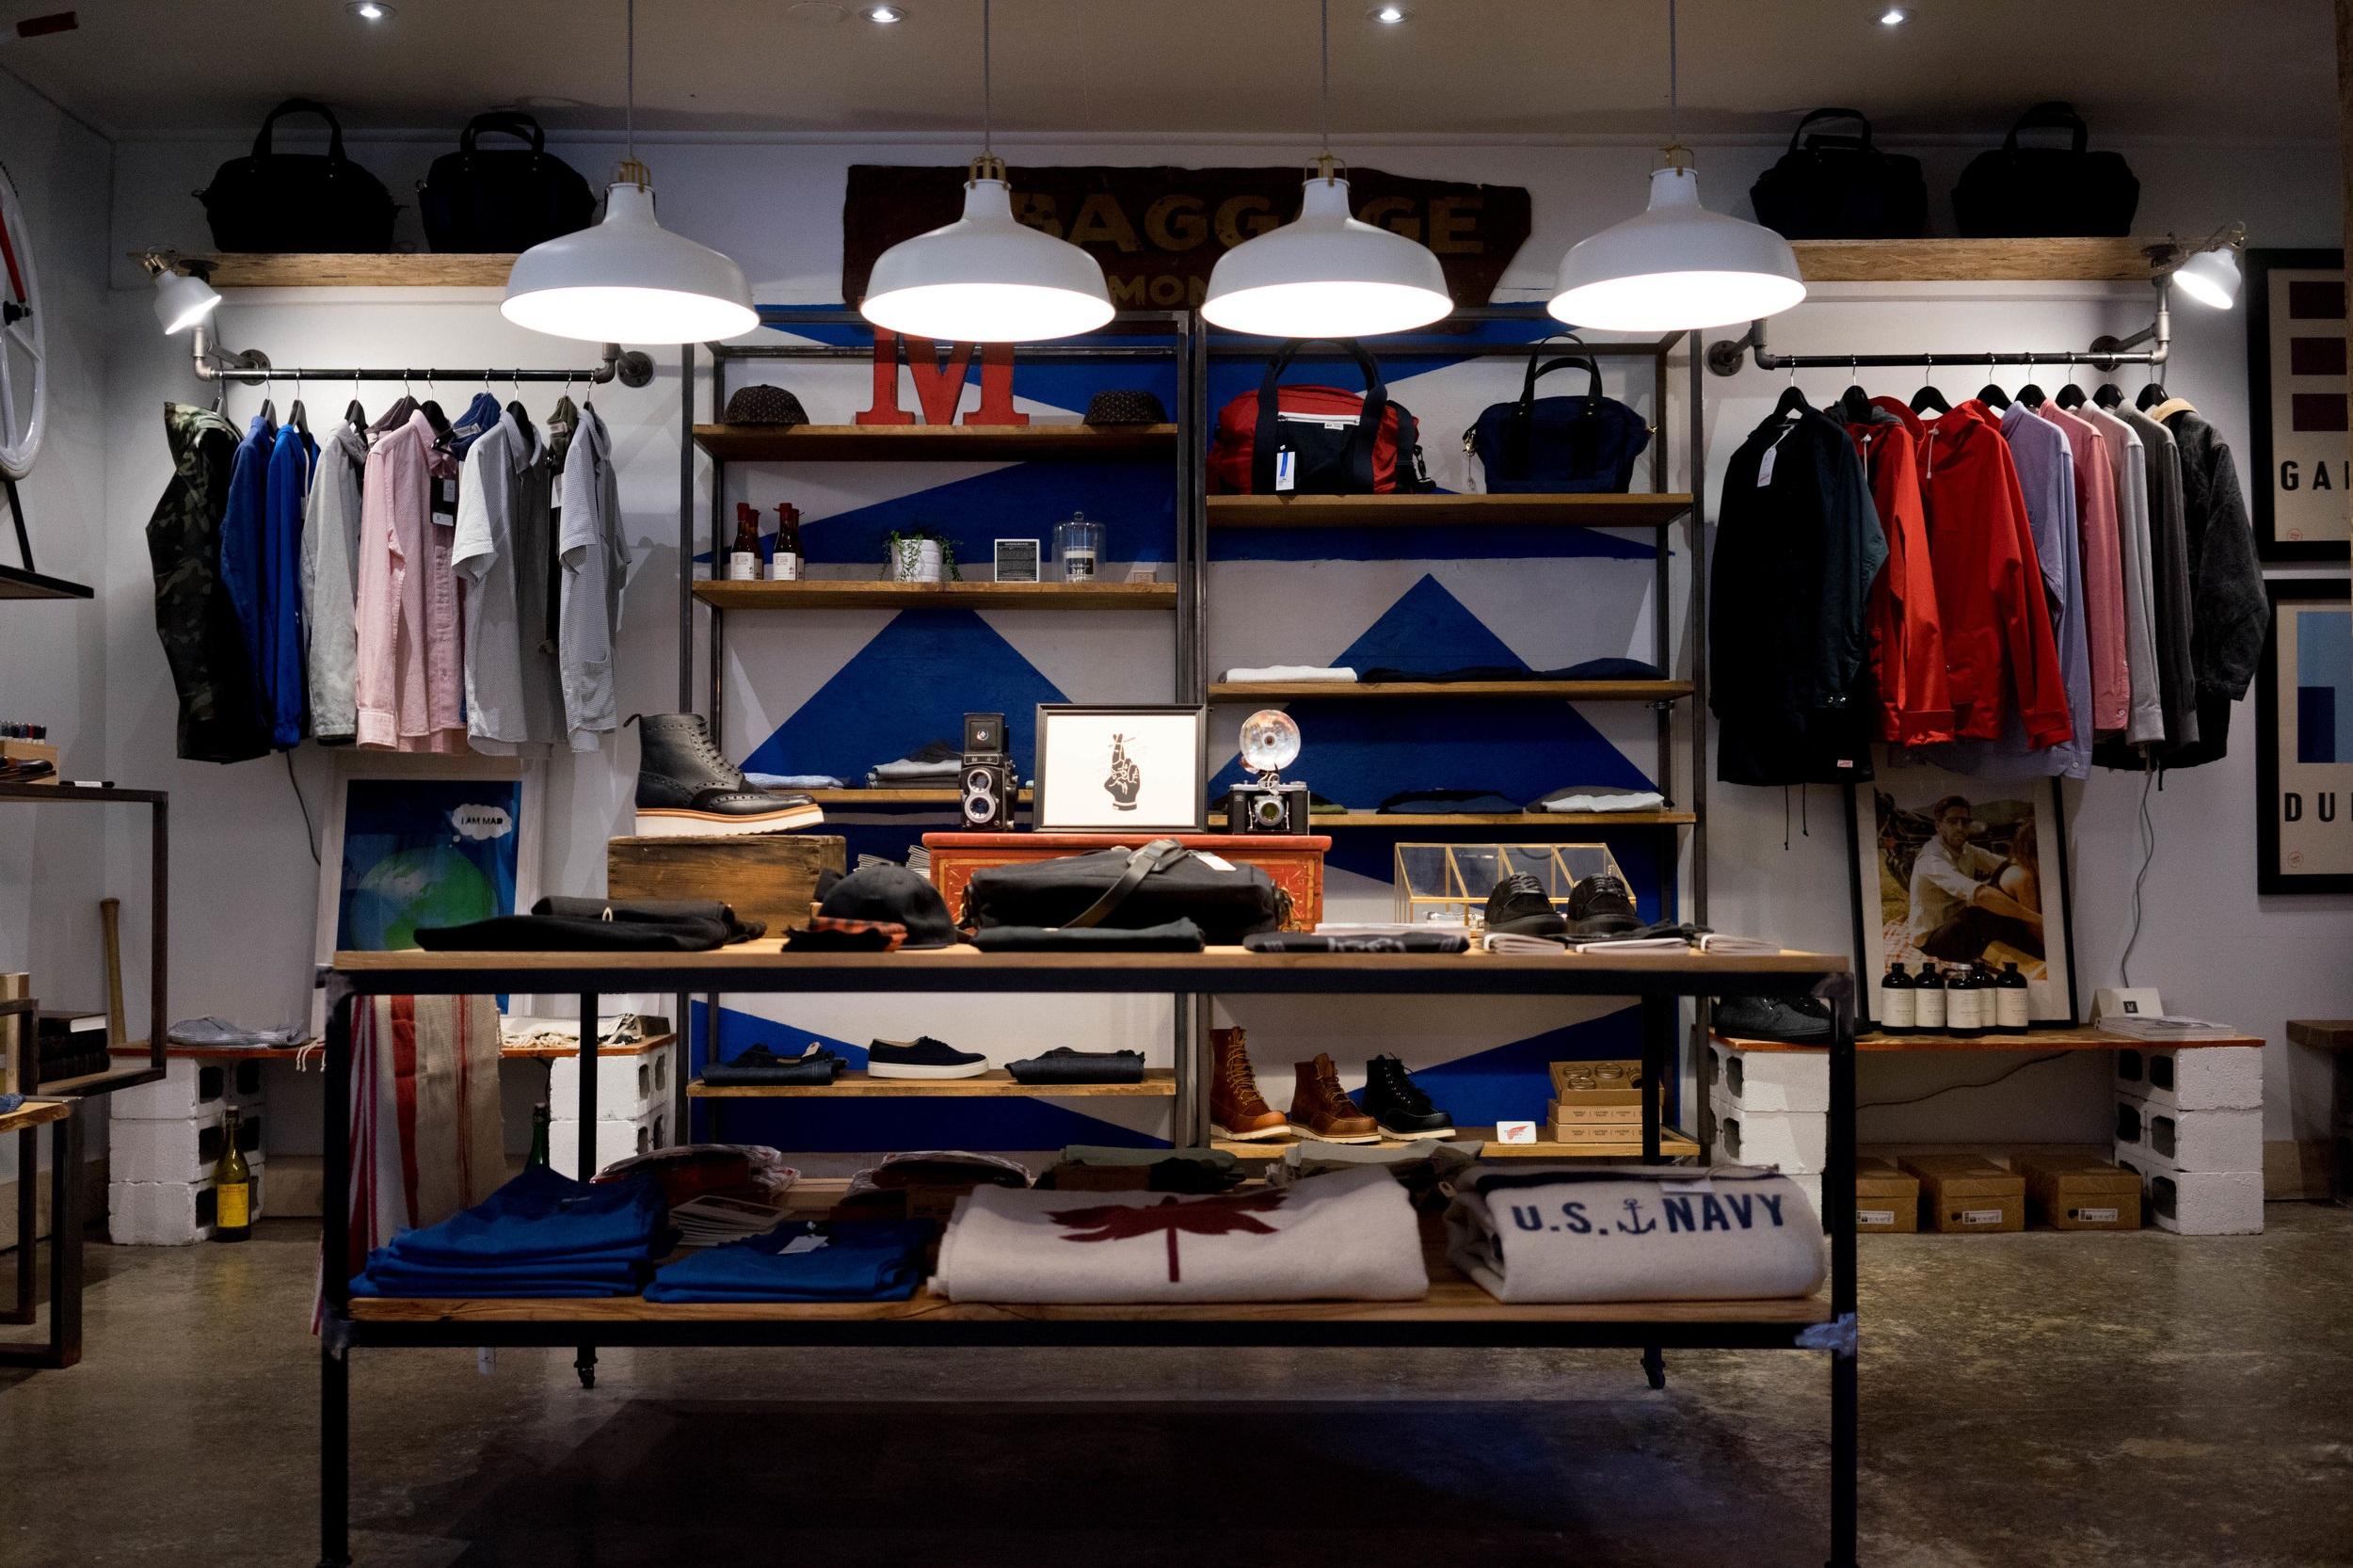 International Fashion retail chain - Boston